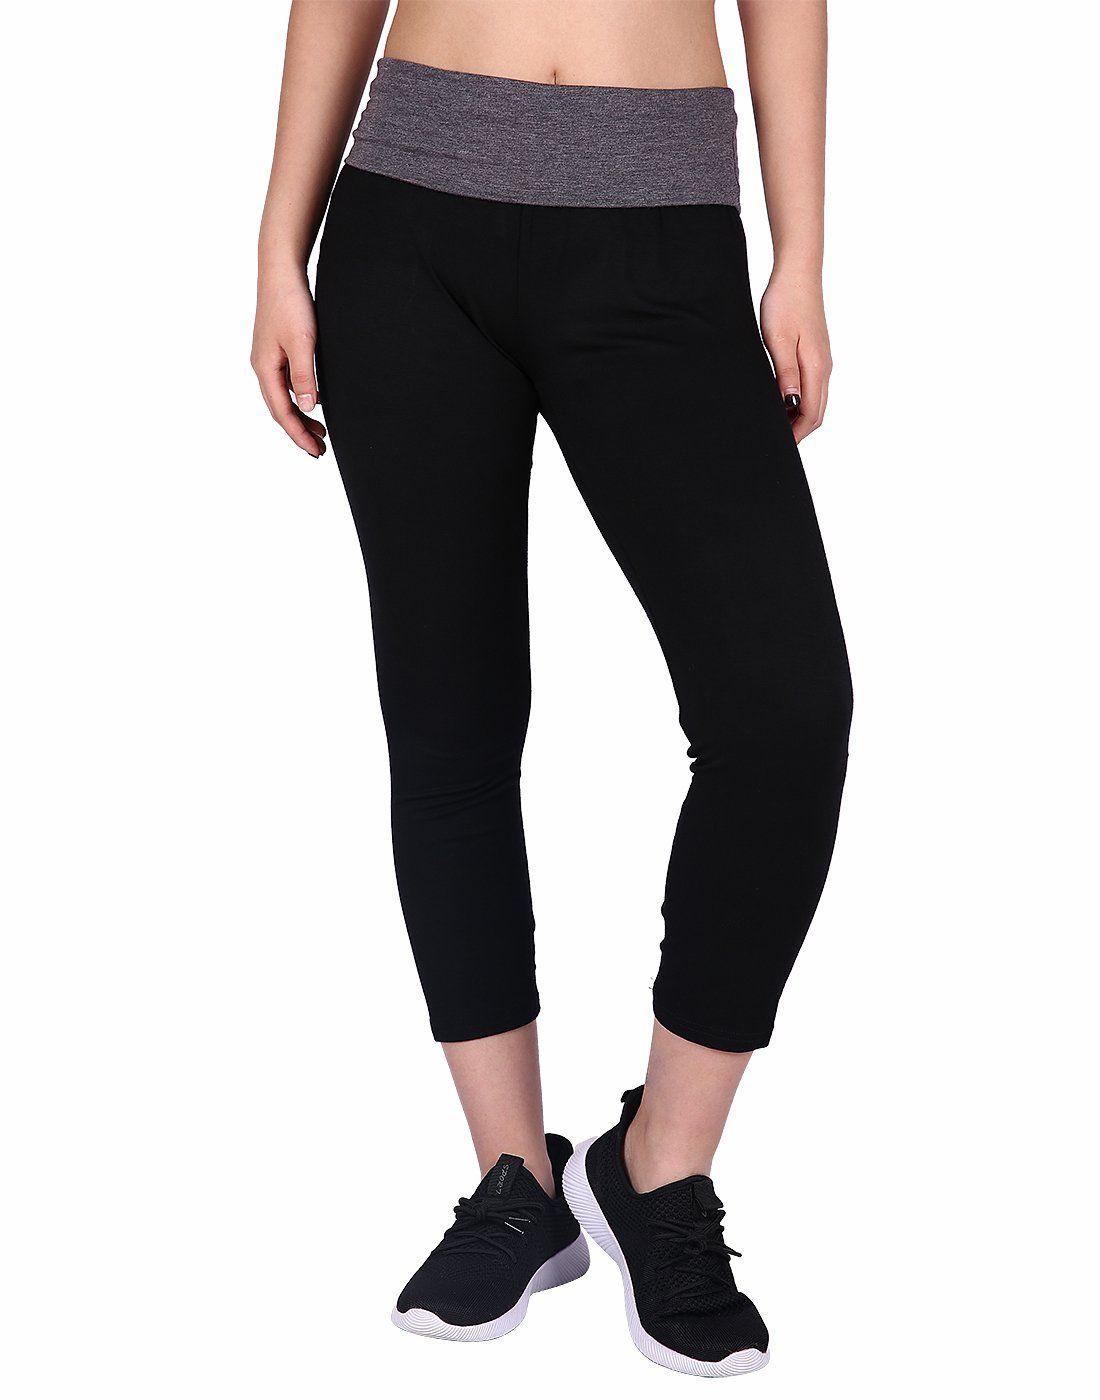 20+ Fold over capri yoga pants ideas